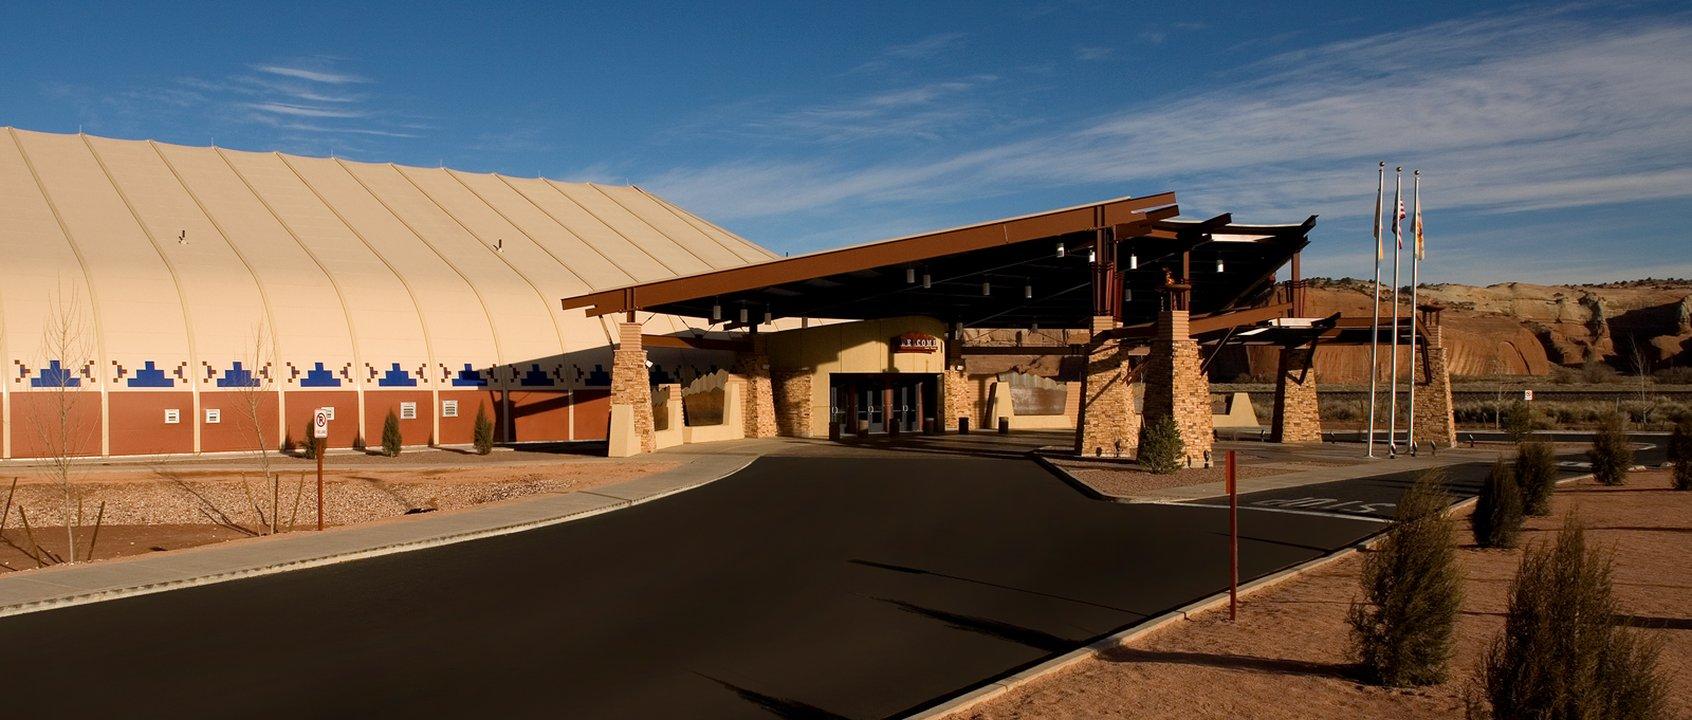 red rock casino resort and spa, charleston, las vegas, nv